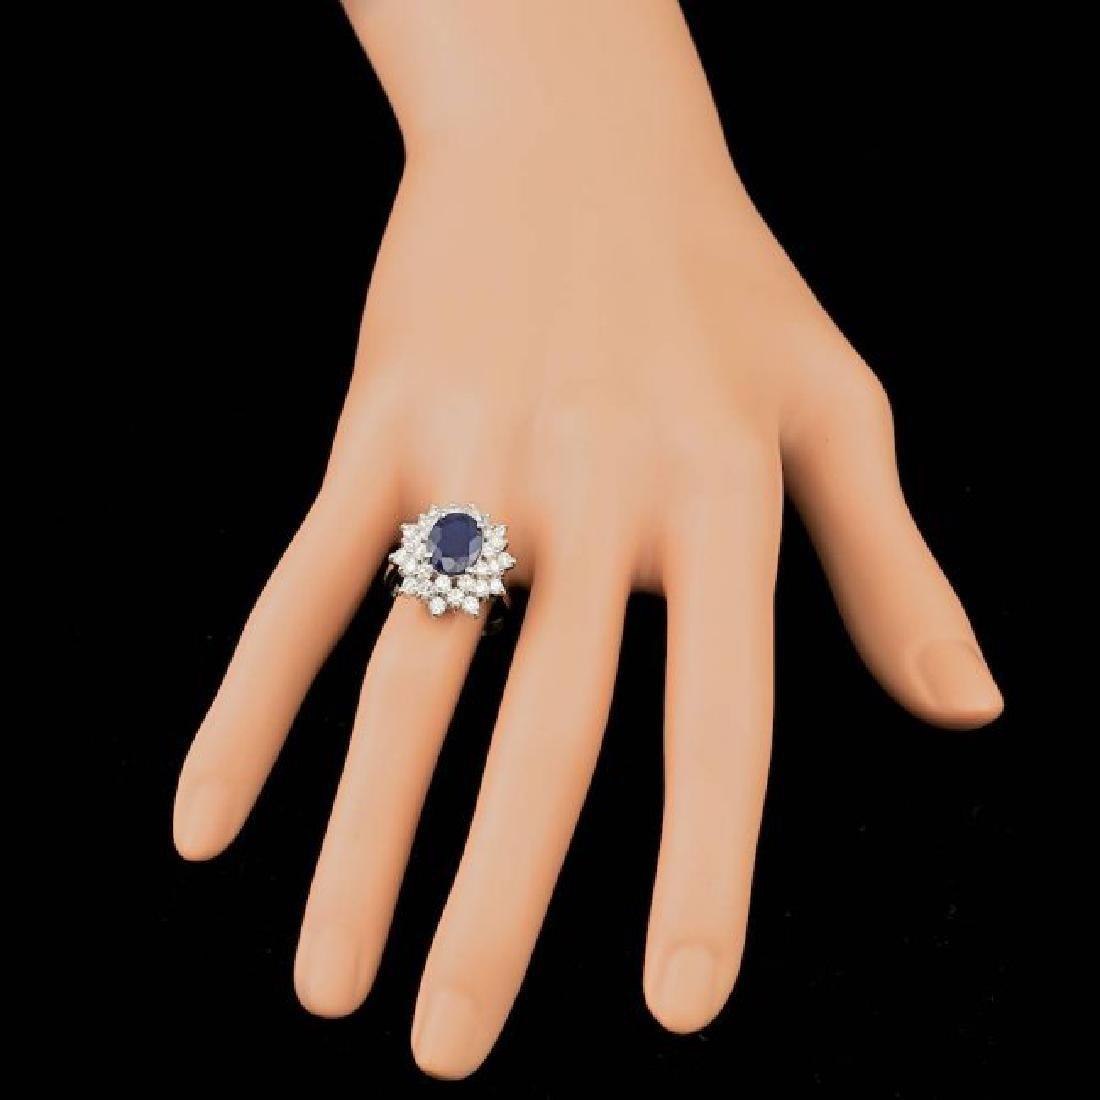 14k Gold 3.30ct Sapphire 1.74ct Diamond Ring - 3